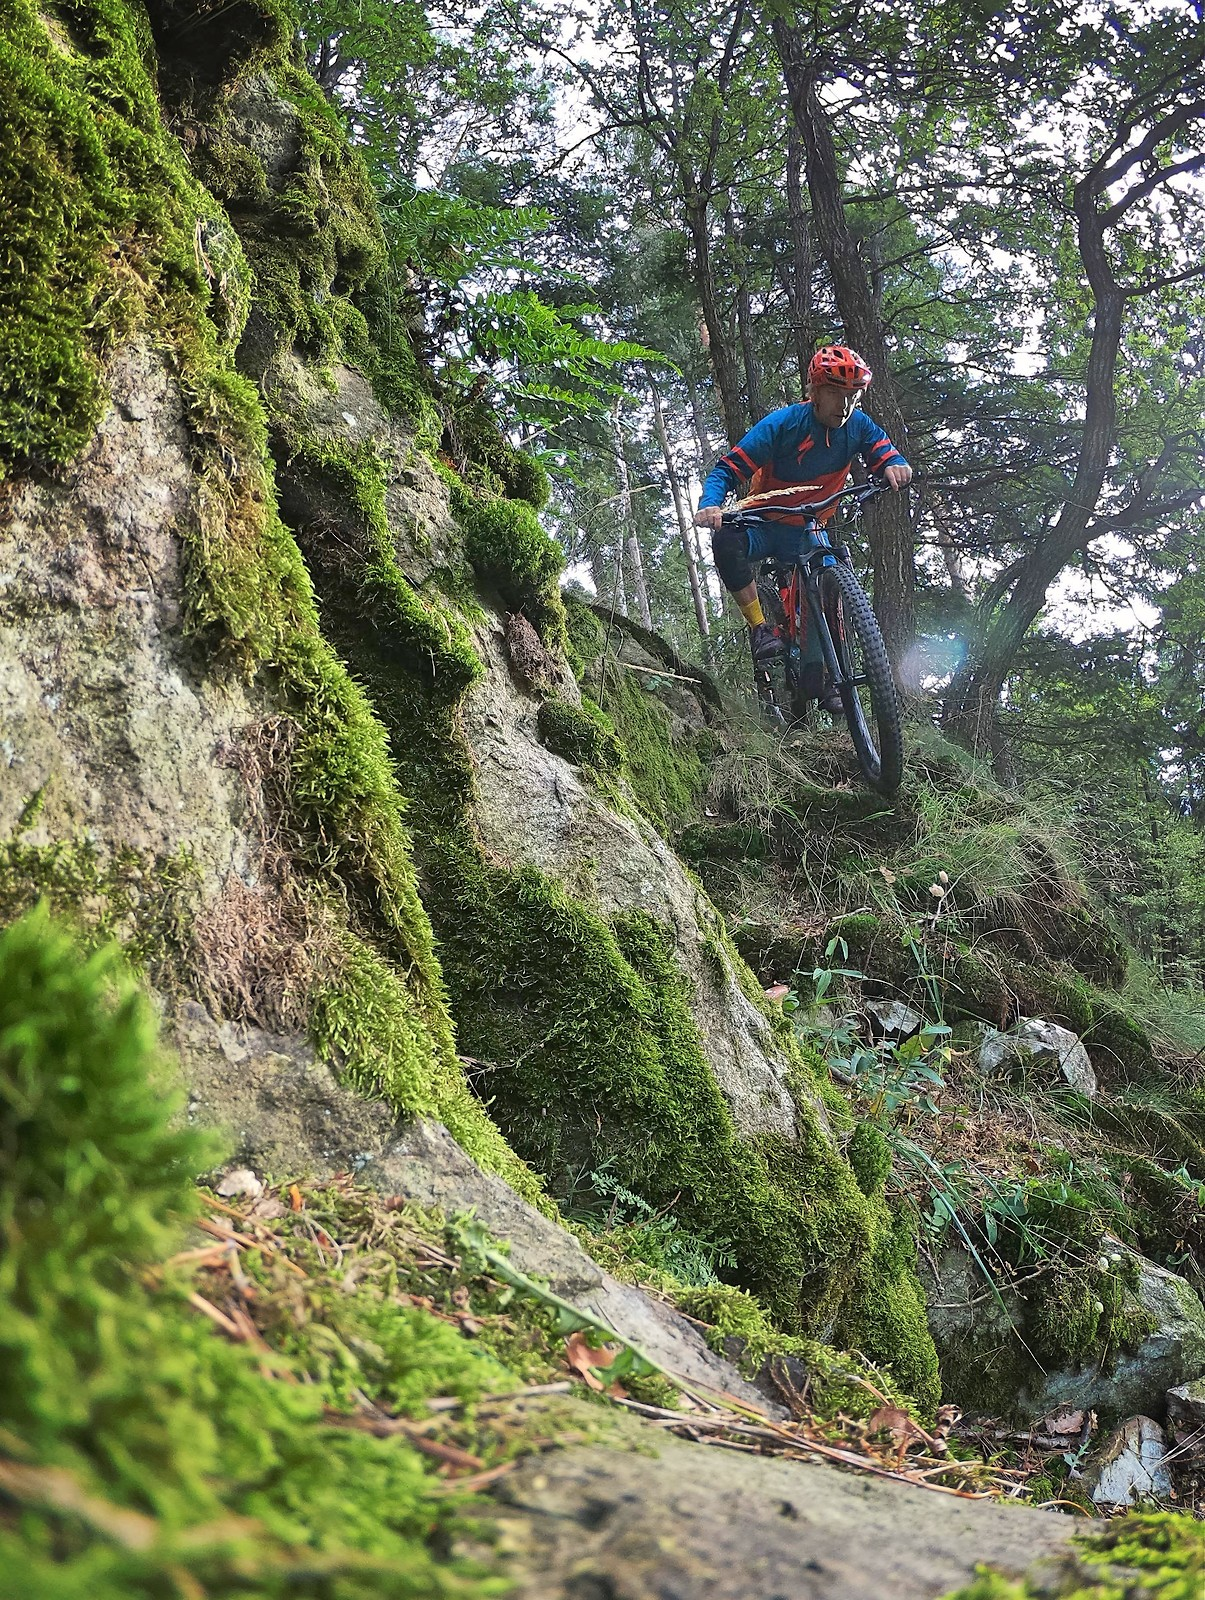 Local Gnar - Piotr_Szwed Szwedowski - Mountain Biking Pictures - Vital MTB